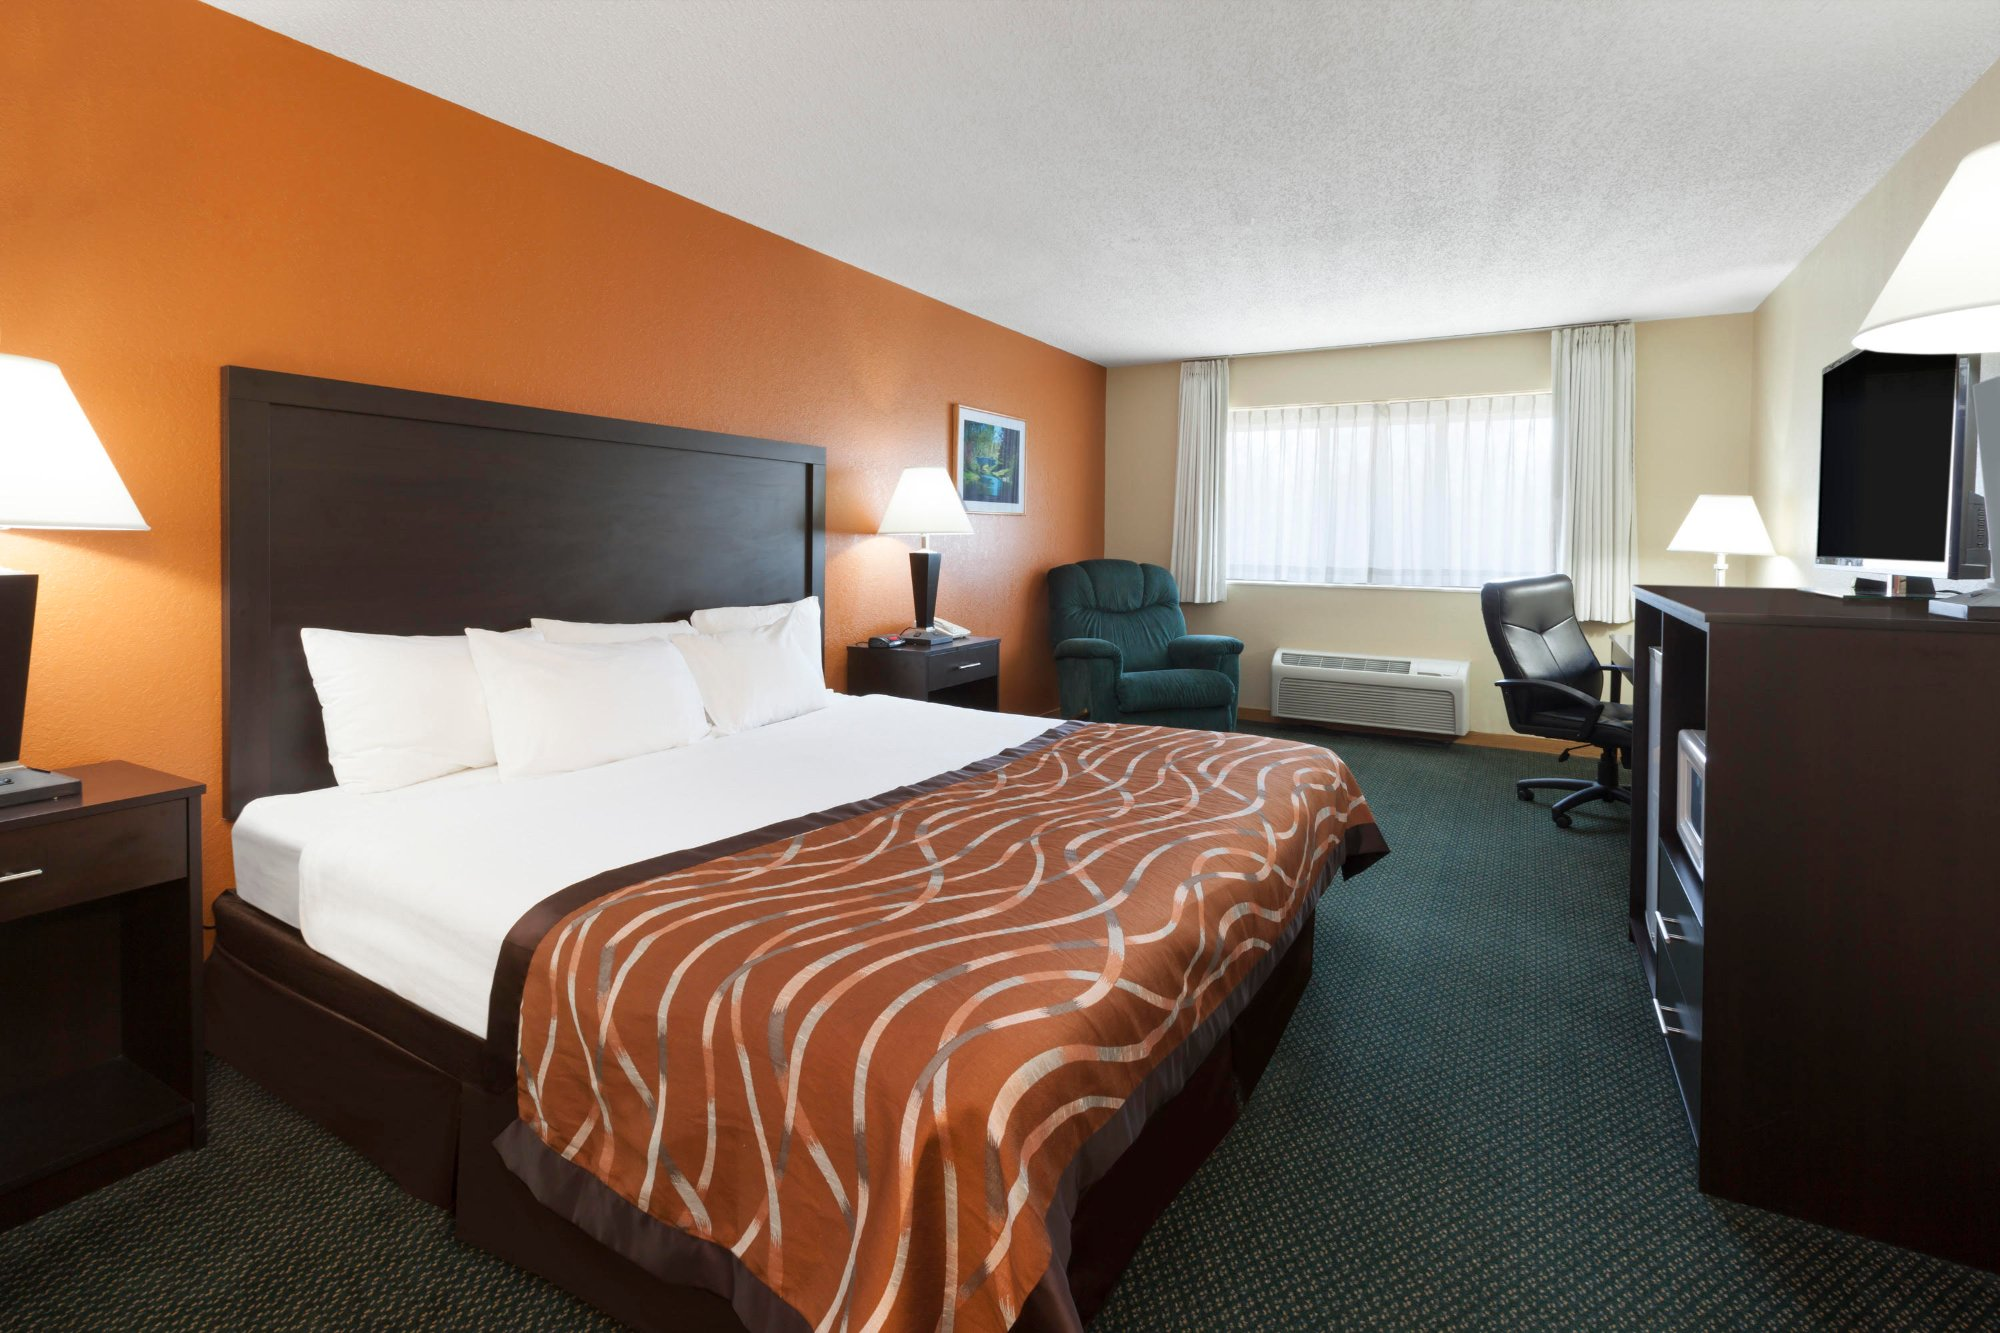 Baymont Inn & Suites Midland